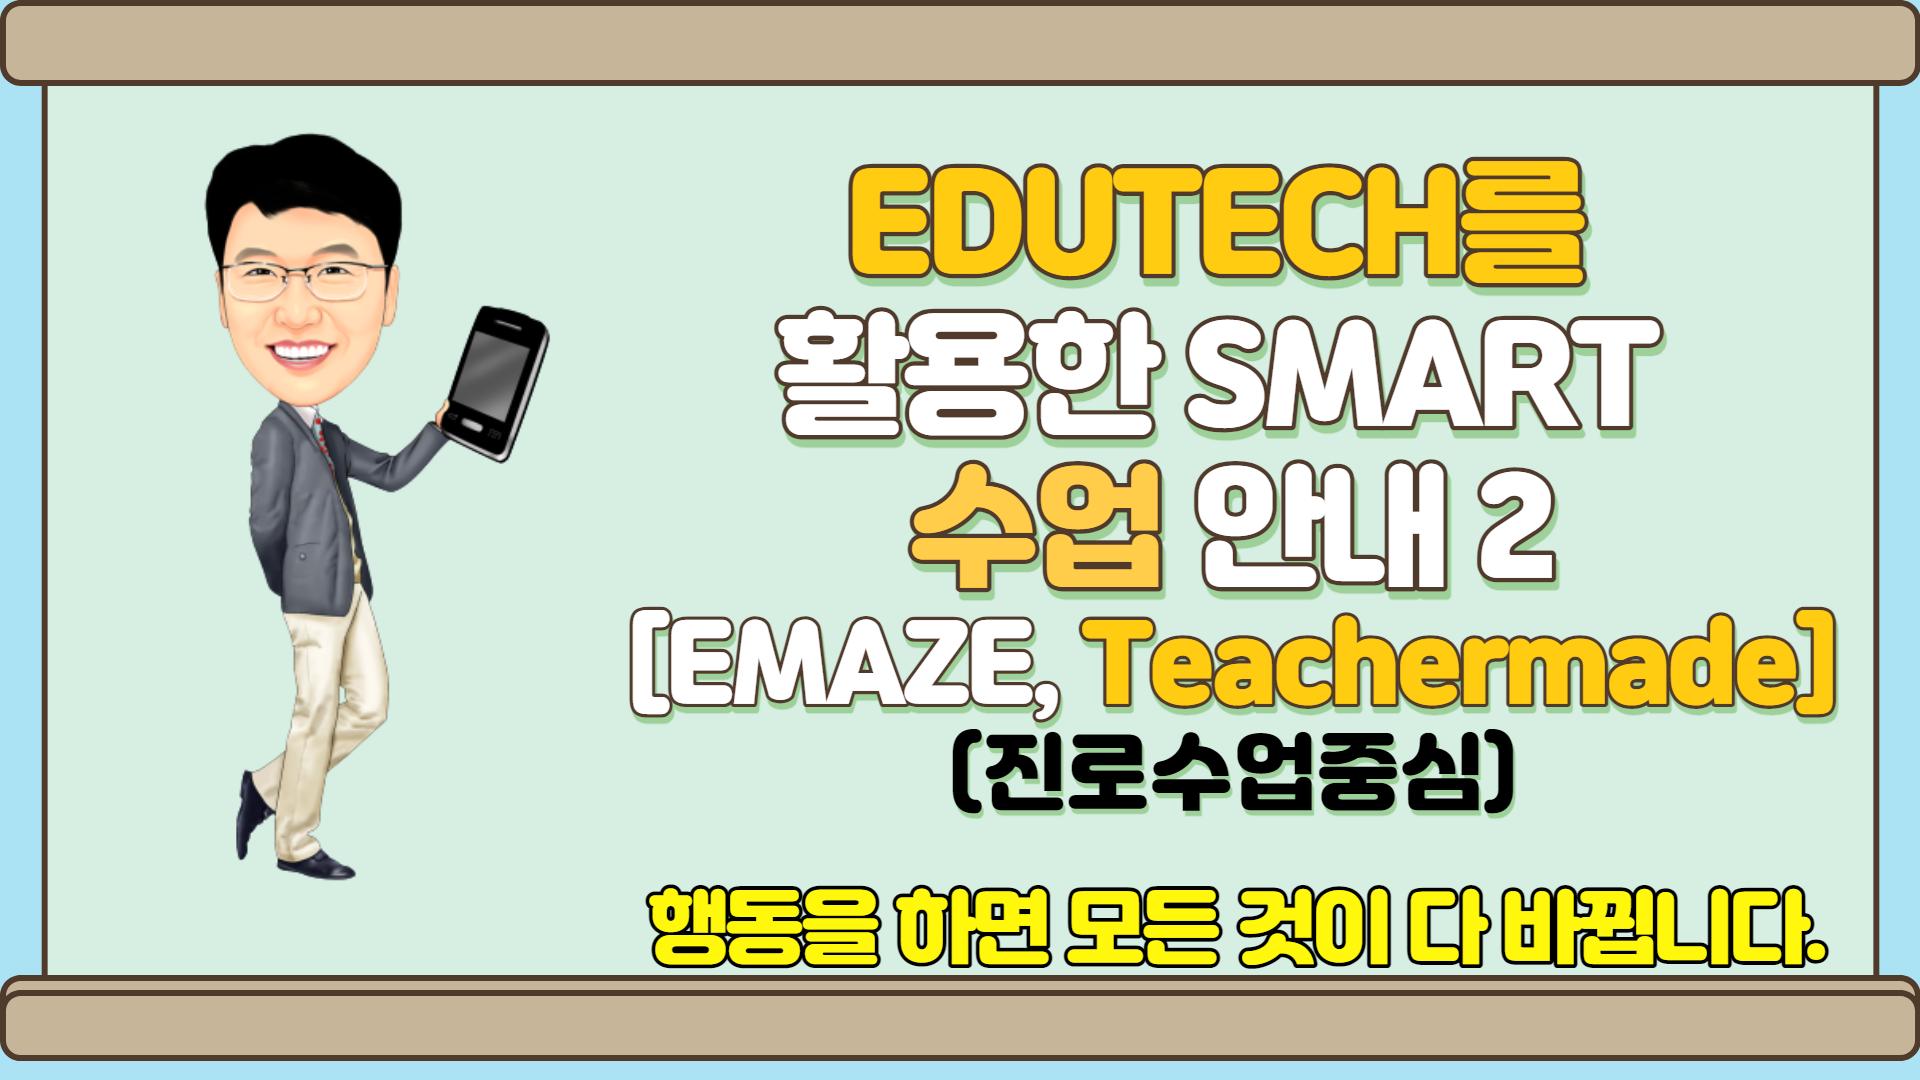 EDUTECH를 활용한 smart 수업 방법 안내2 (Teachermade, EMAZE)